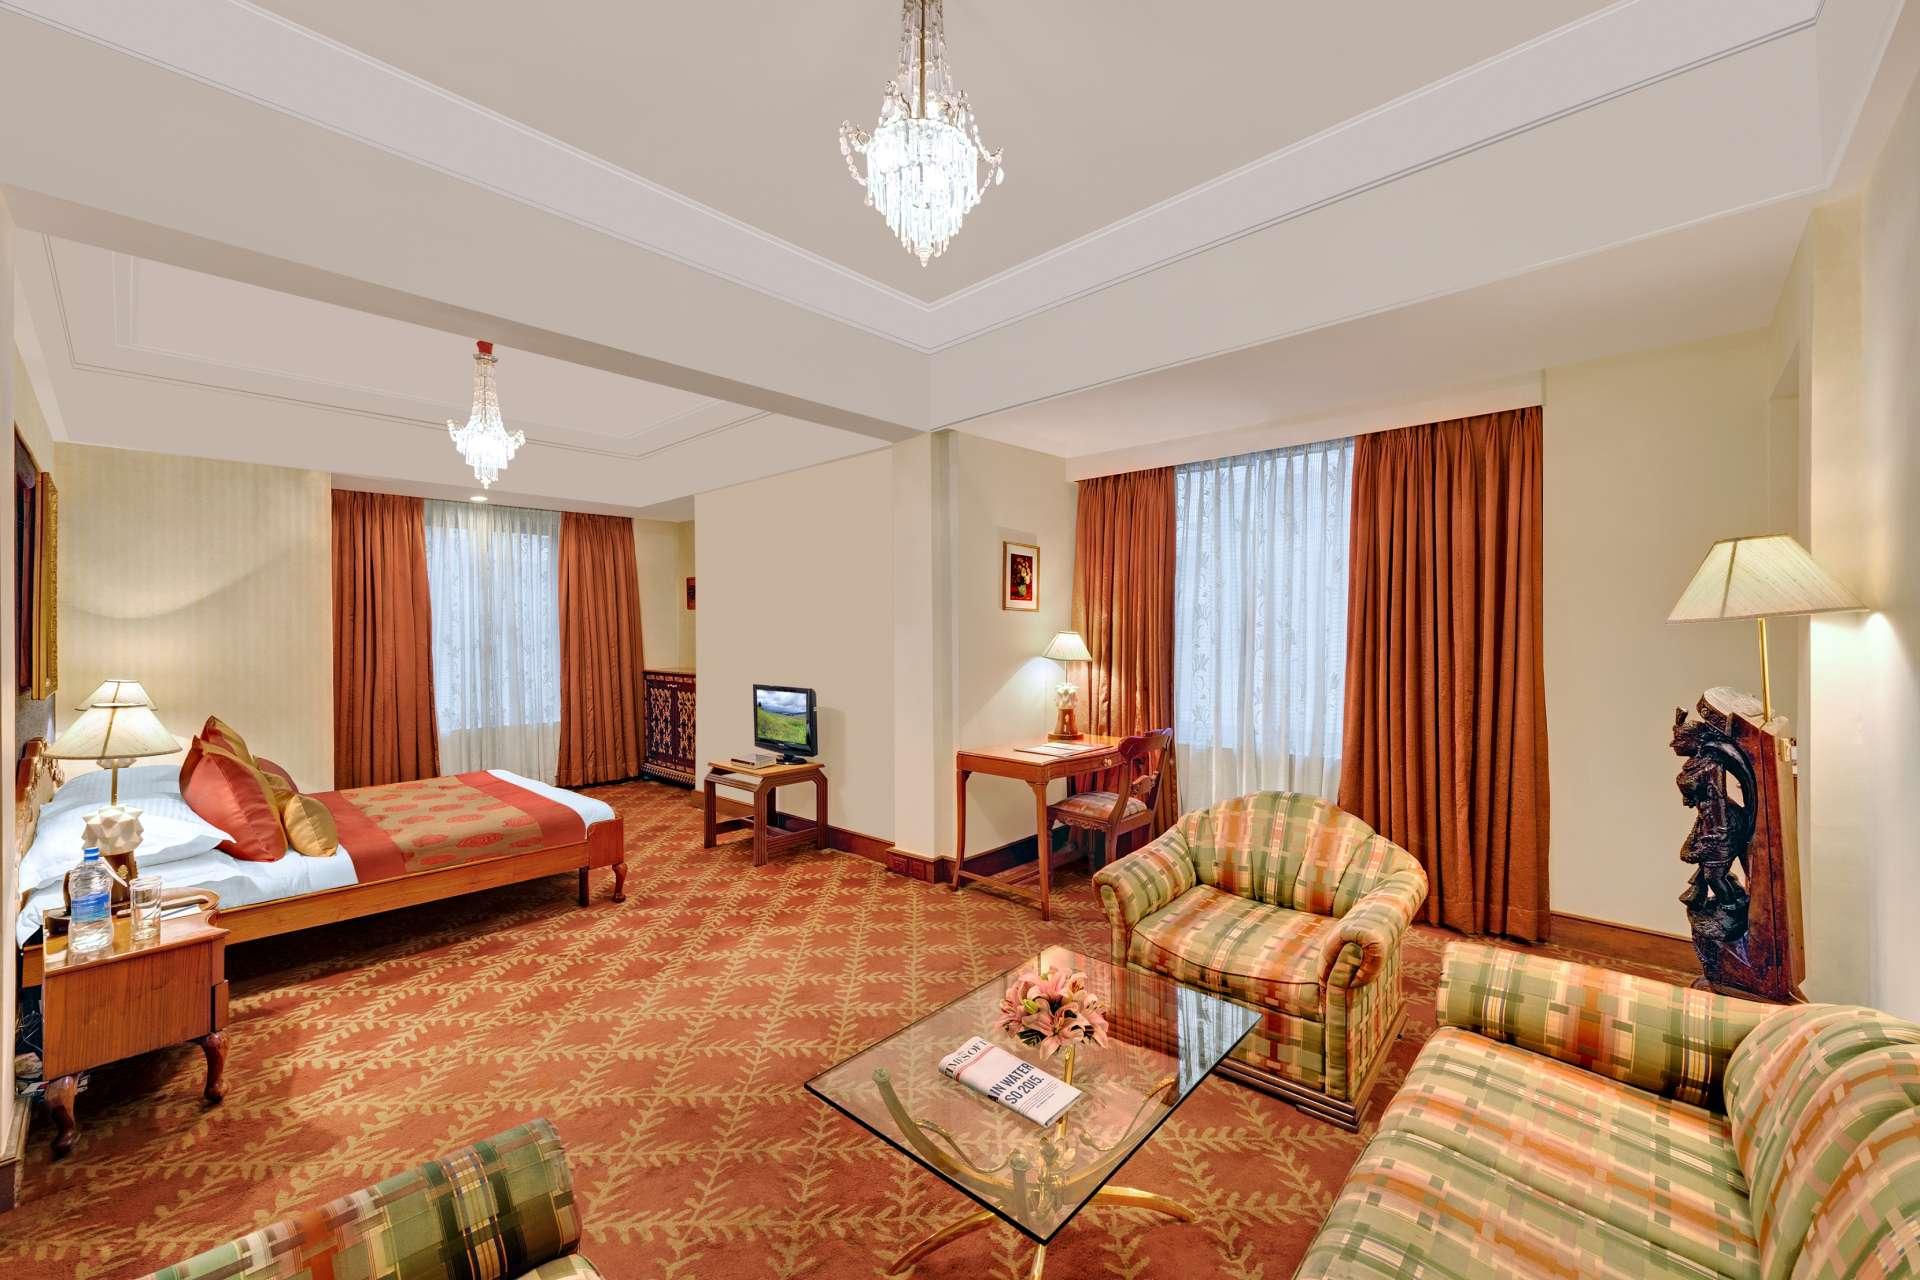 the ambassador junior suite banner - The Ambassador   Heritage Hotels in Mumbai, Aurangabad, Chennai - Our Rooms